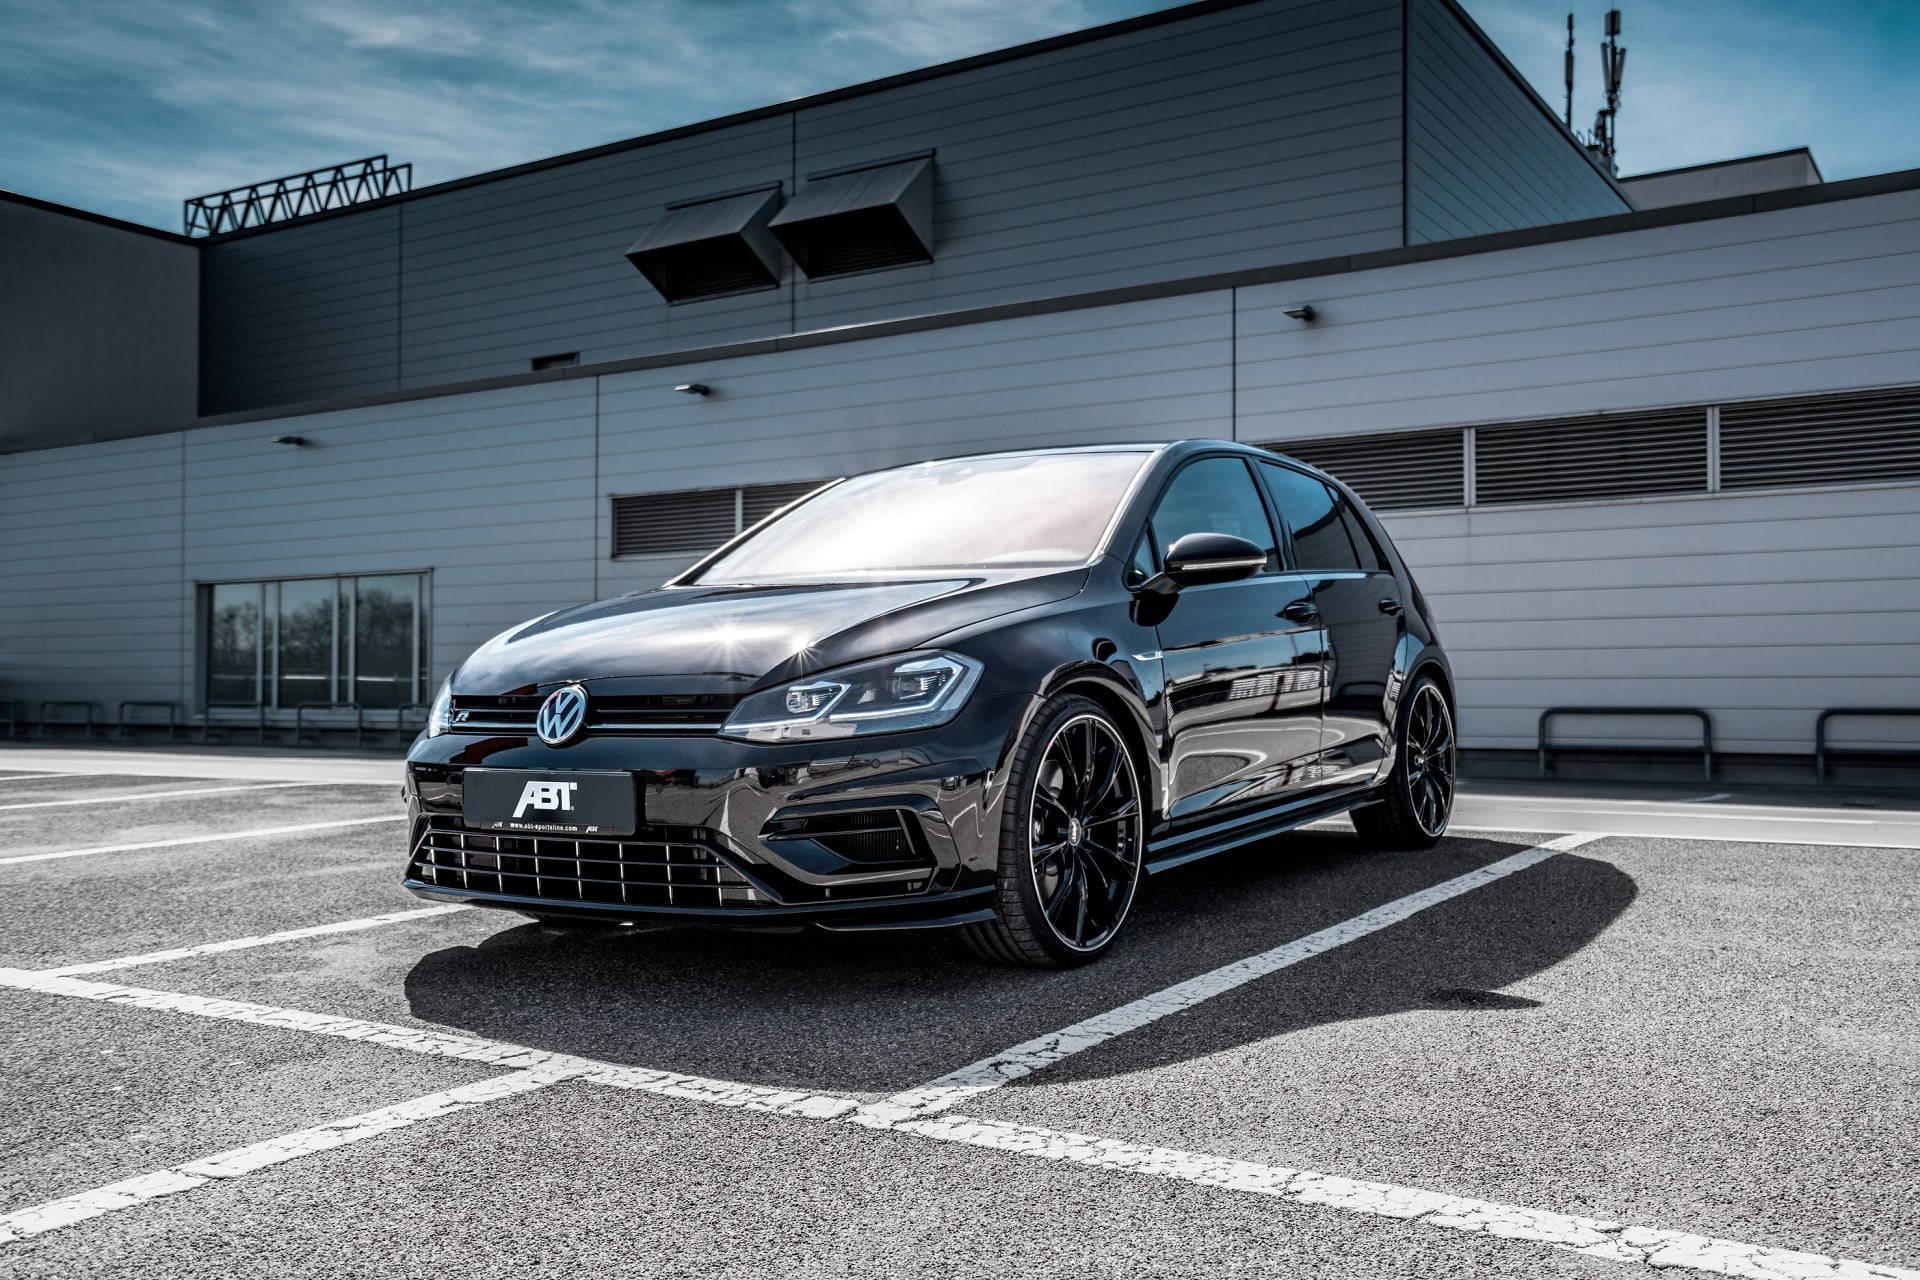 ABT lleva el Volkswagen Golf R VII hasta 355 HP